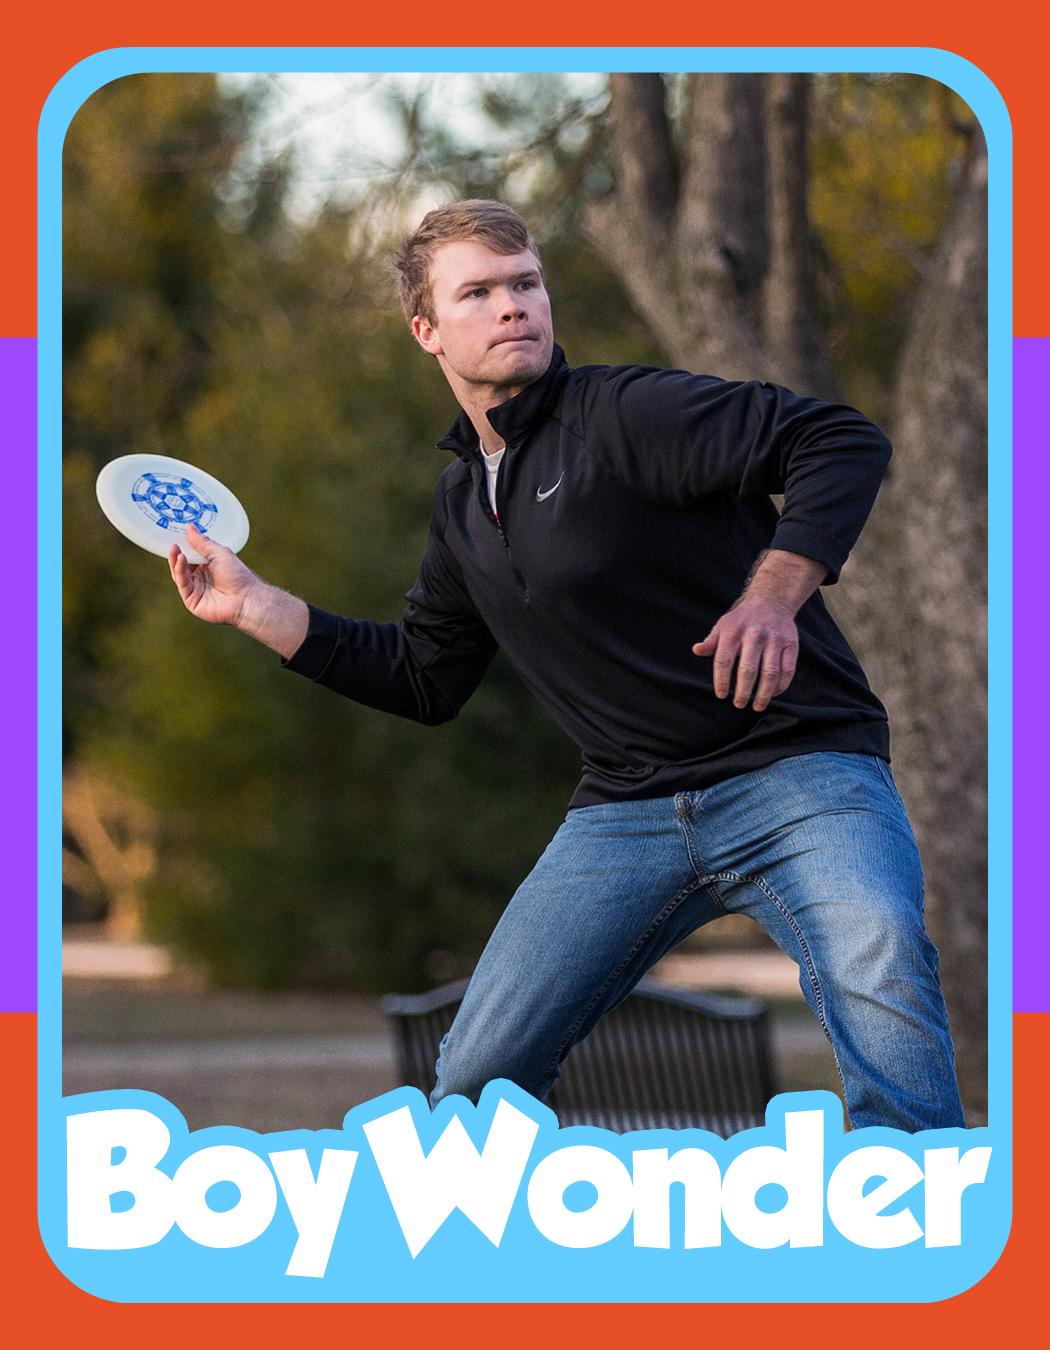 Boy-Wonder-Disc-Card.jpg